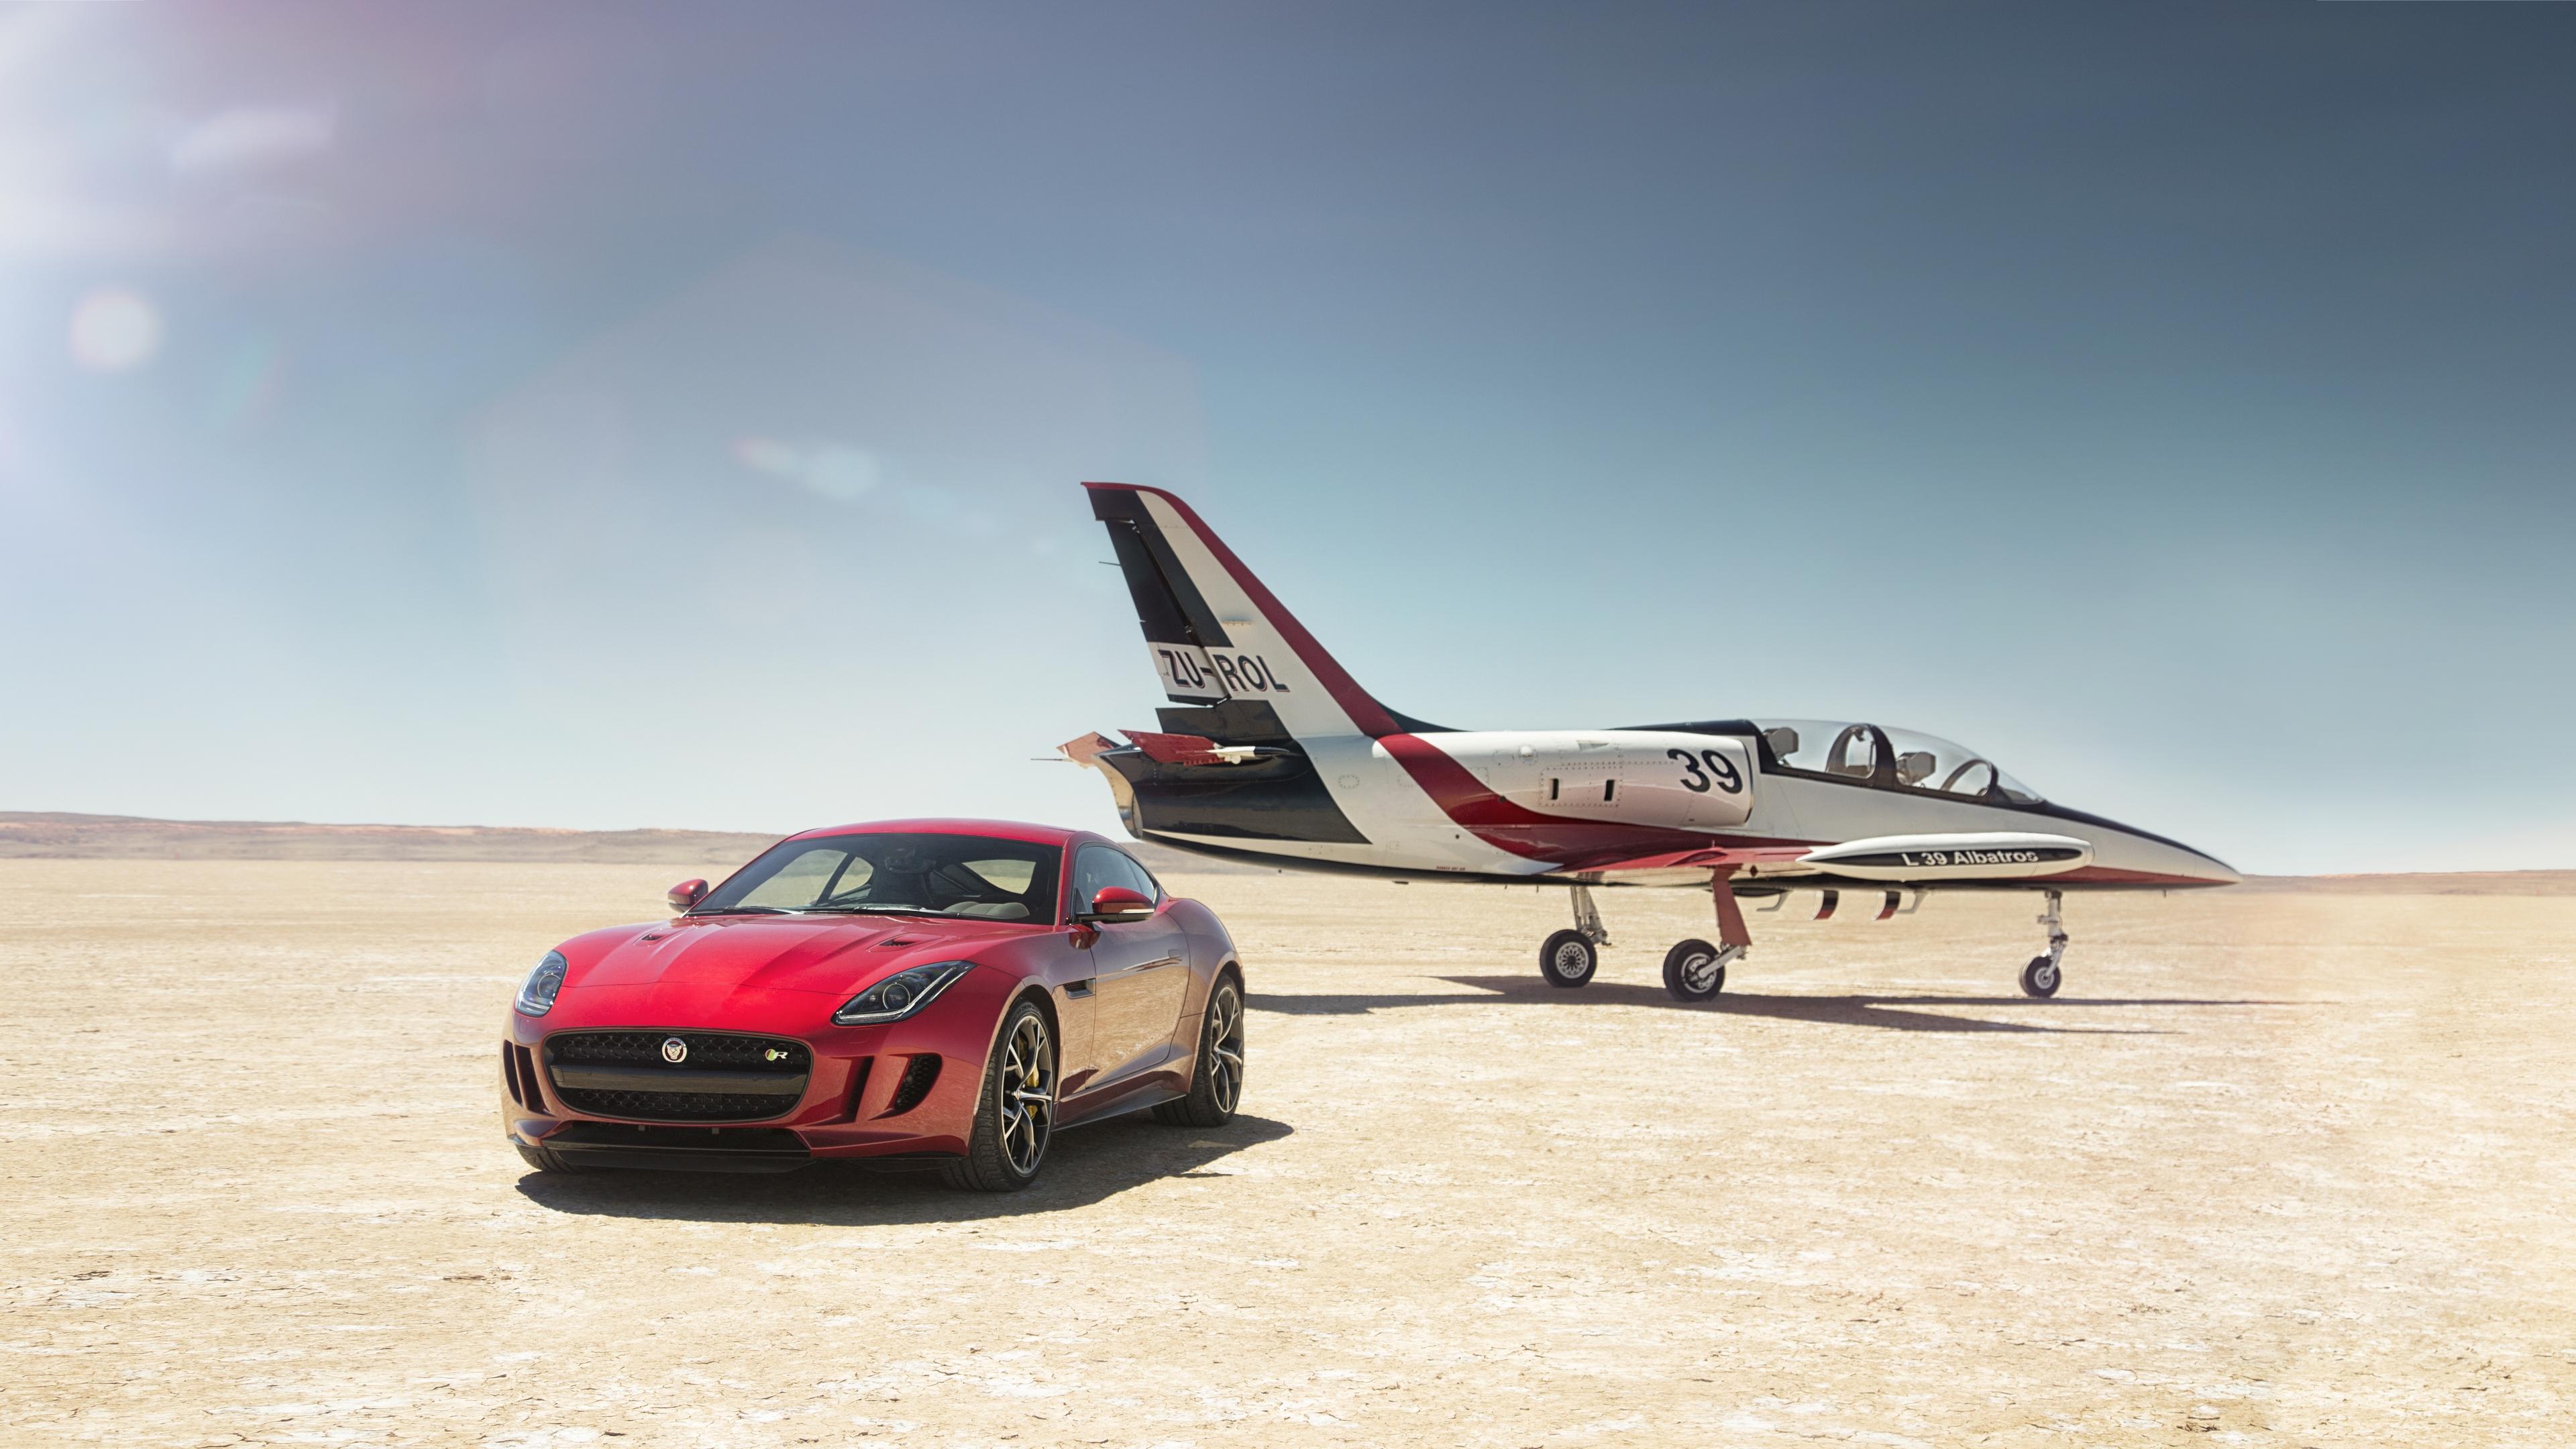 Wallpaper 4k Jaguar F Type With Jet 4k 2019 Cars Wallpapers 4k